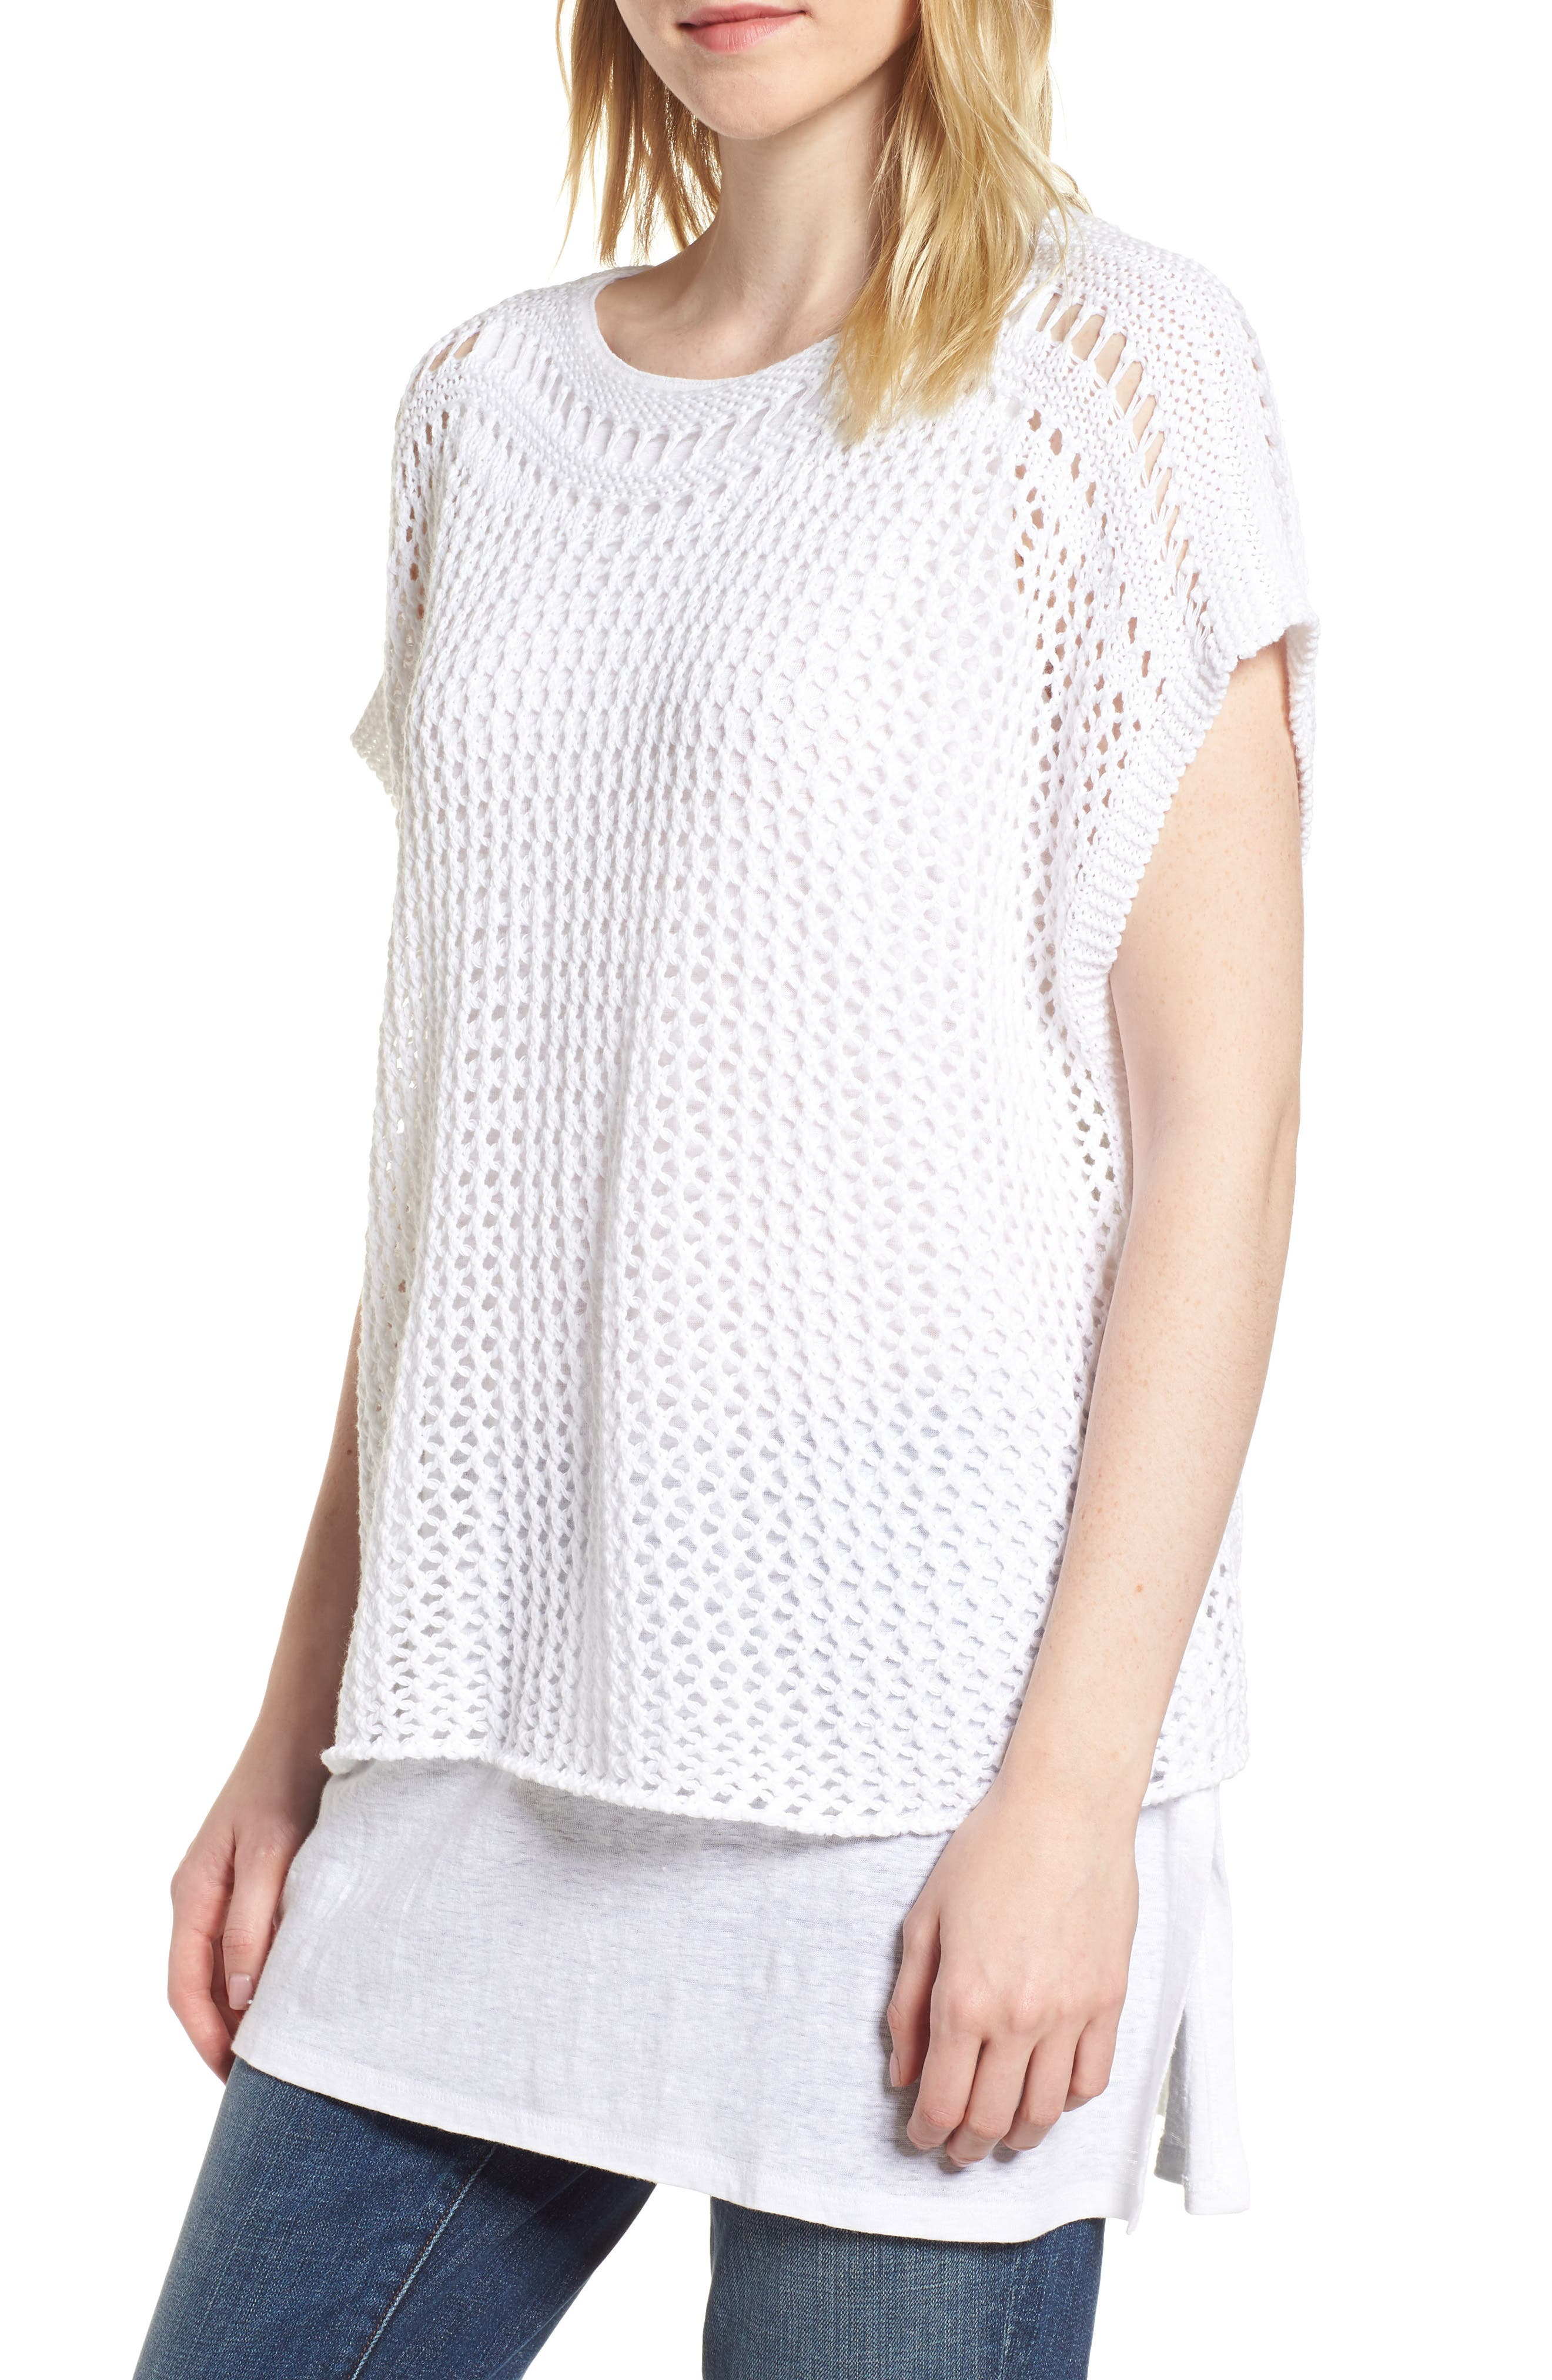 Organic Cotton Sweater,                             Main thumbnail 1, color,                             White